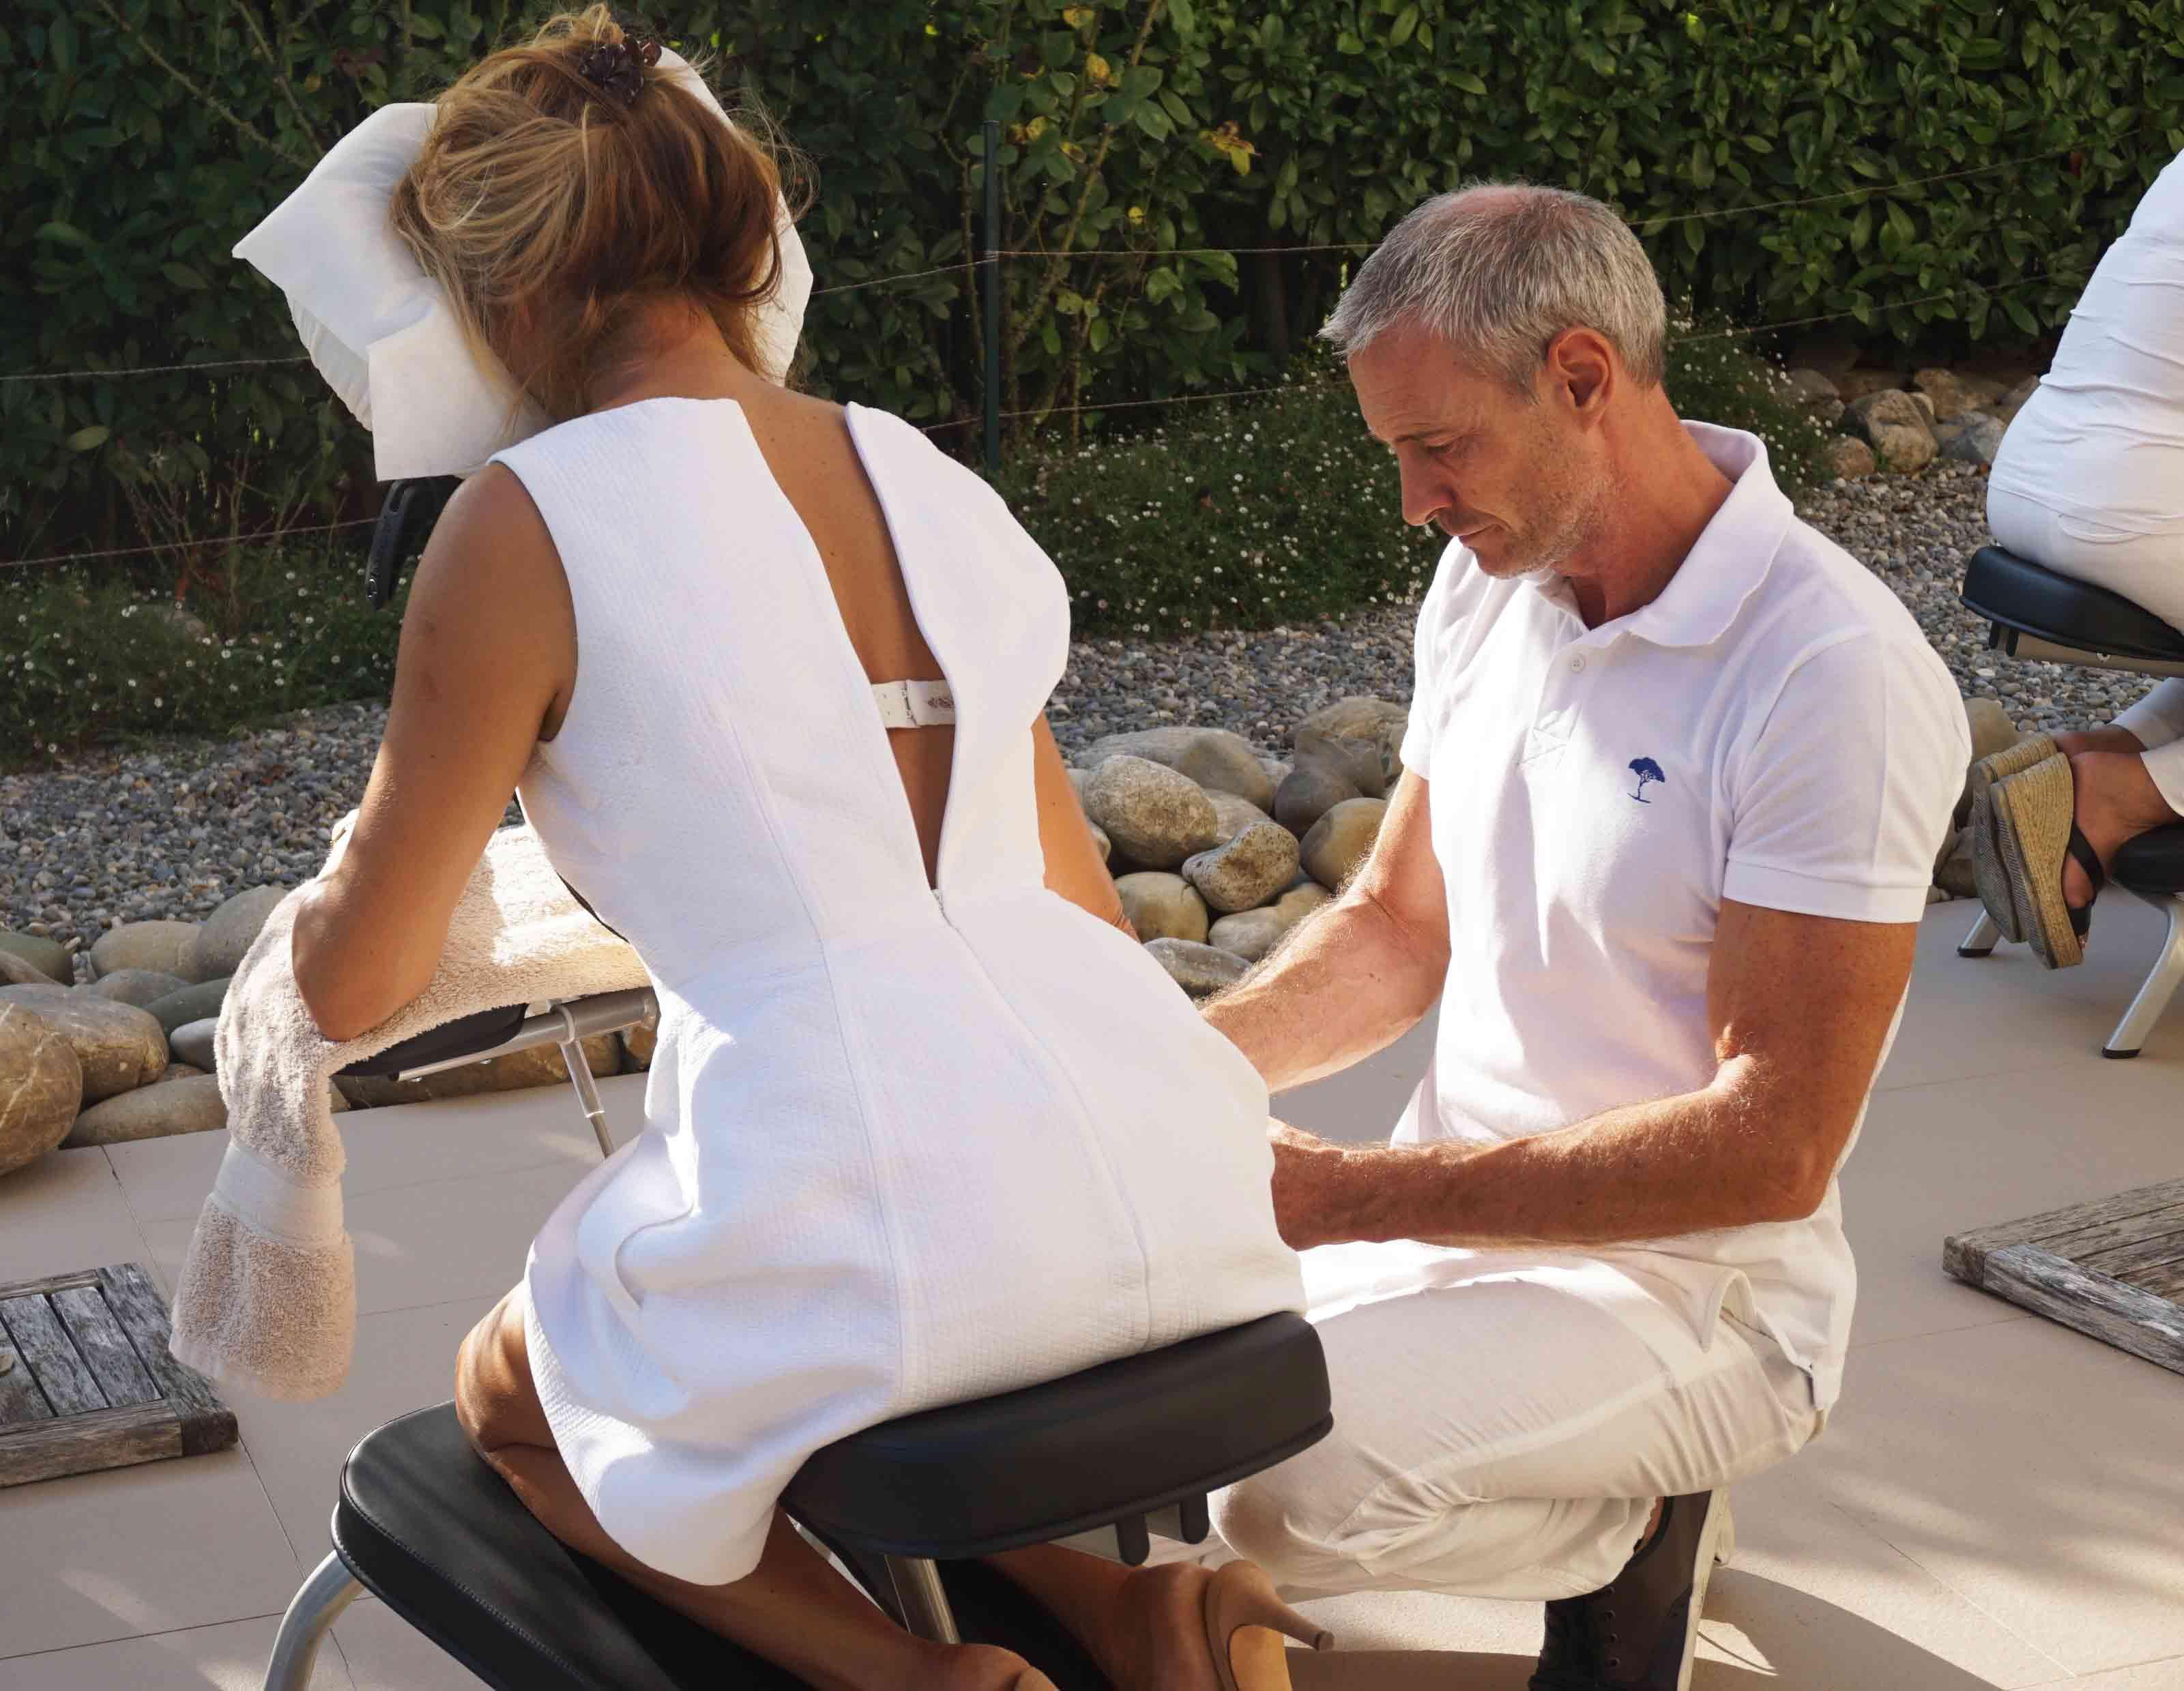 chair massage company mougins, cannes, sophia antipolis